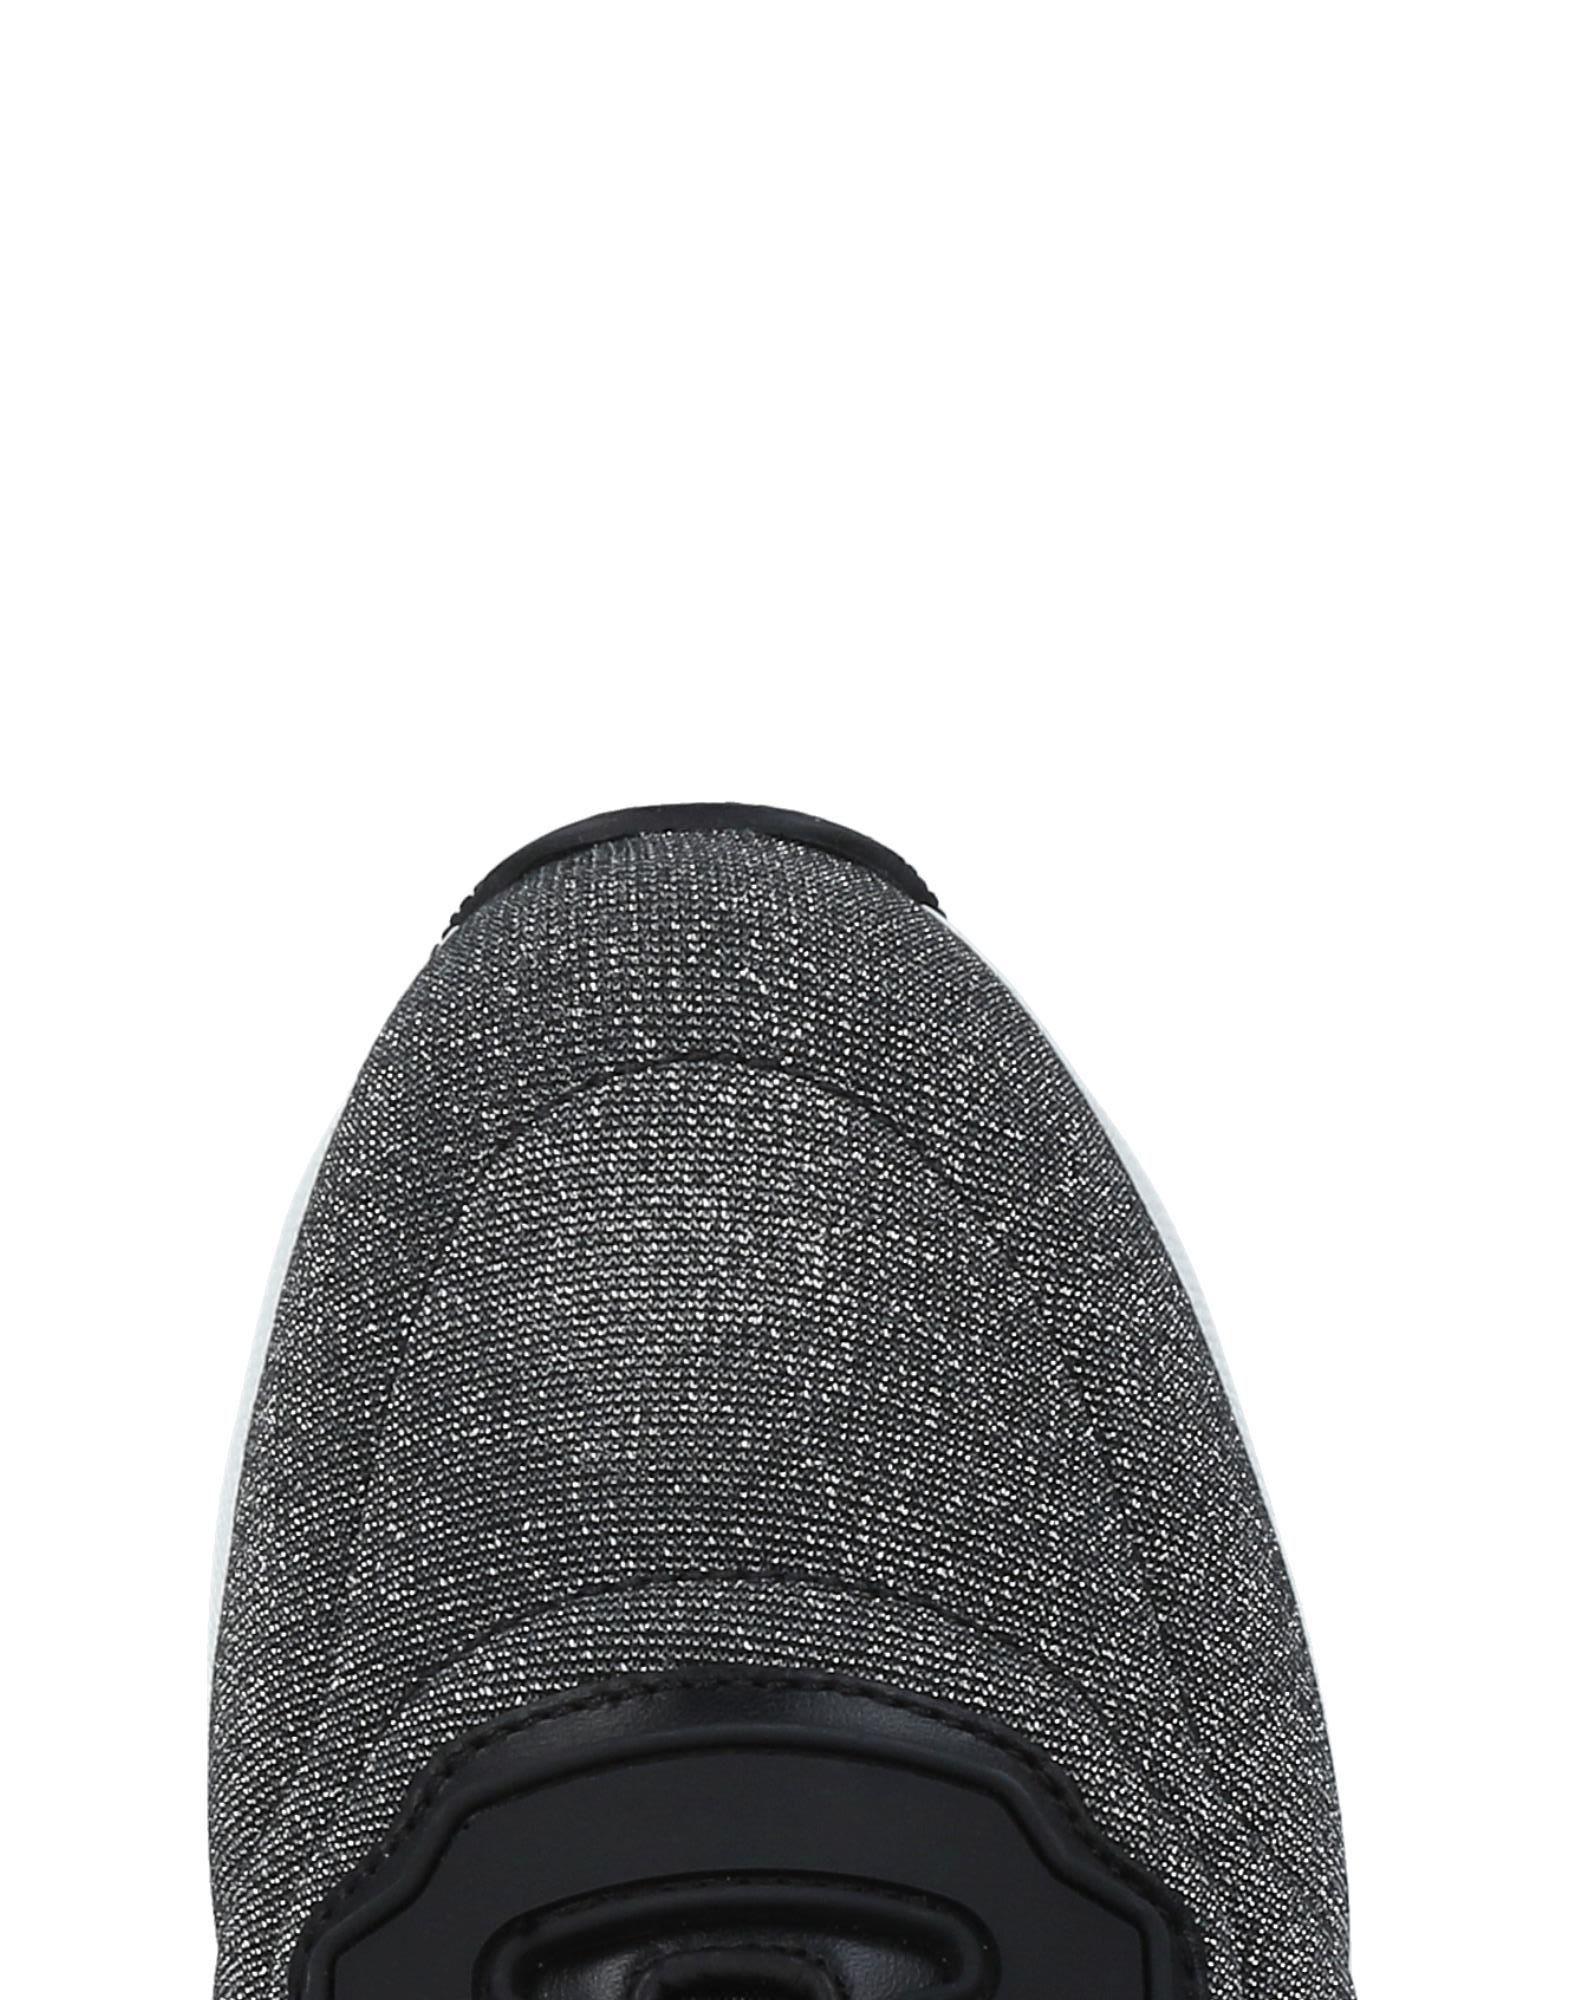 Rabatt Schuhe Prada 11482633SU Sport Sneakers Damen  11482633SU Prada 18e89f